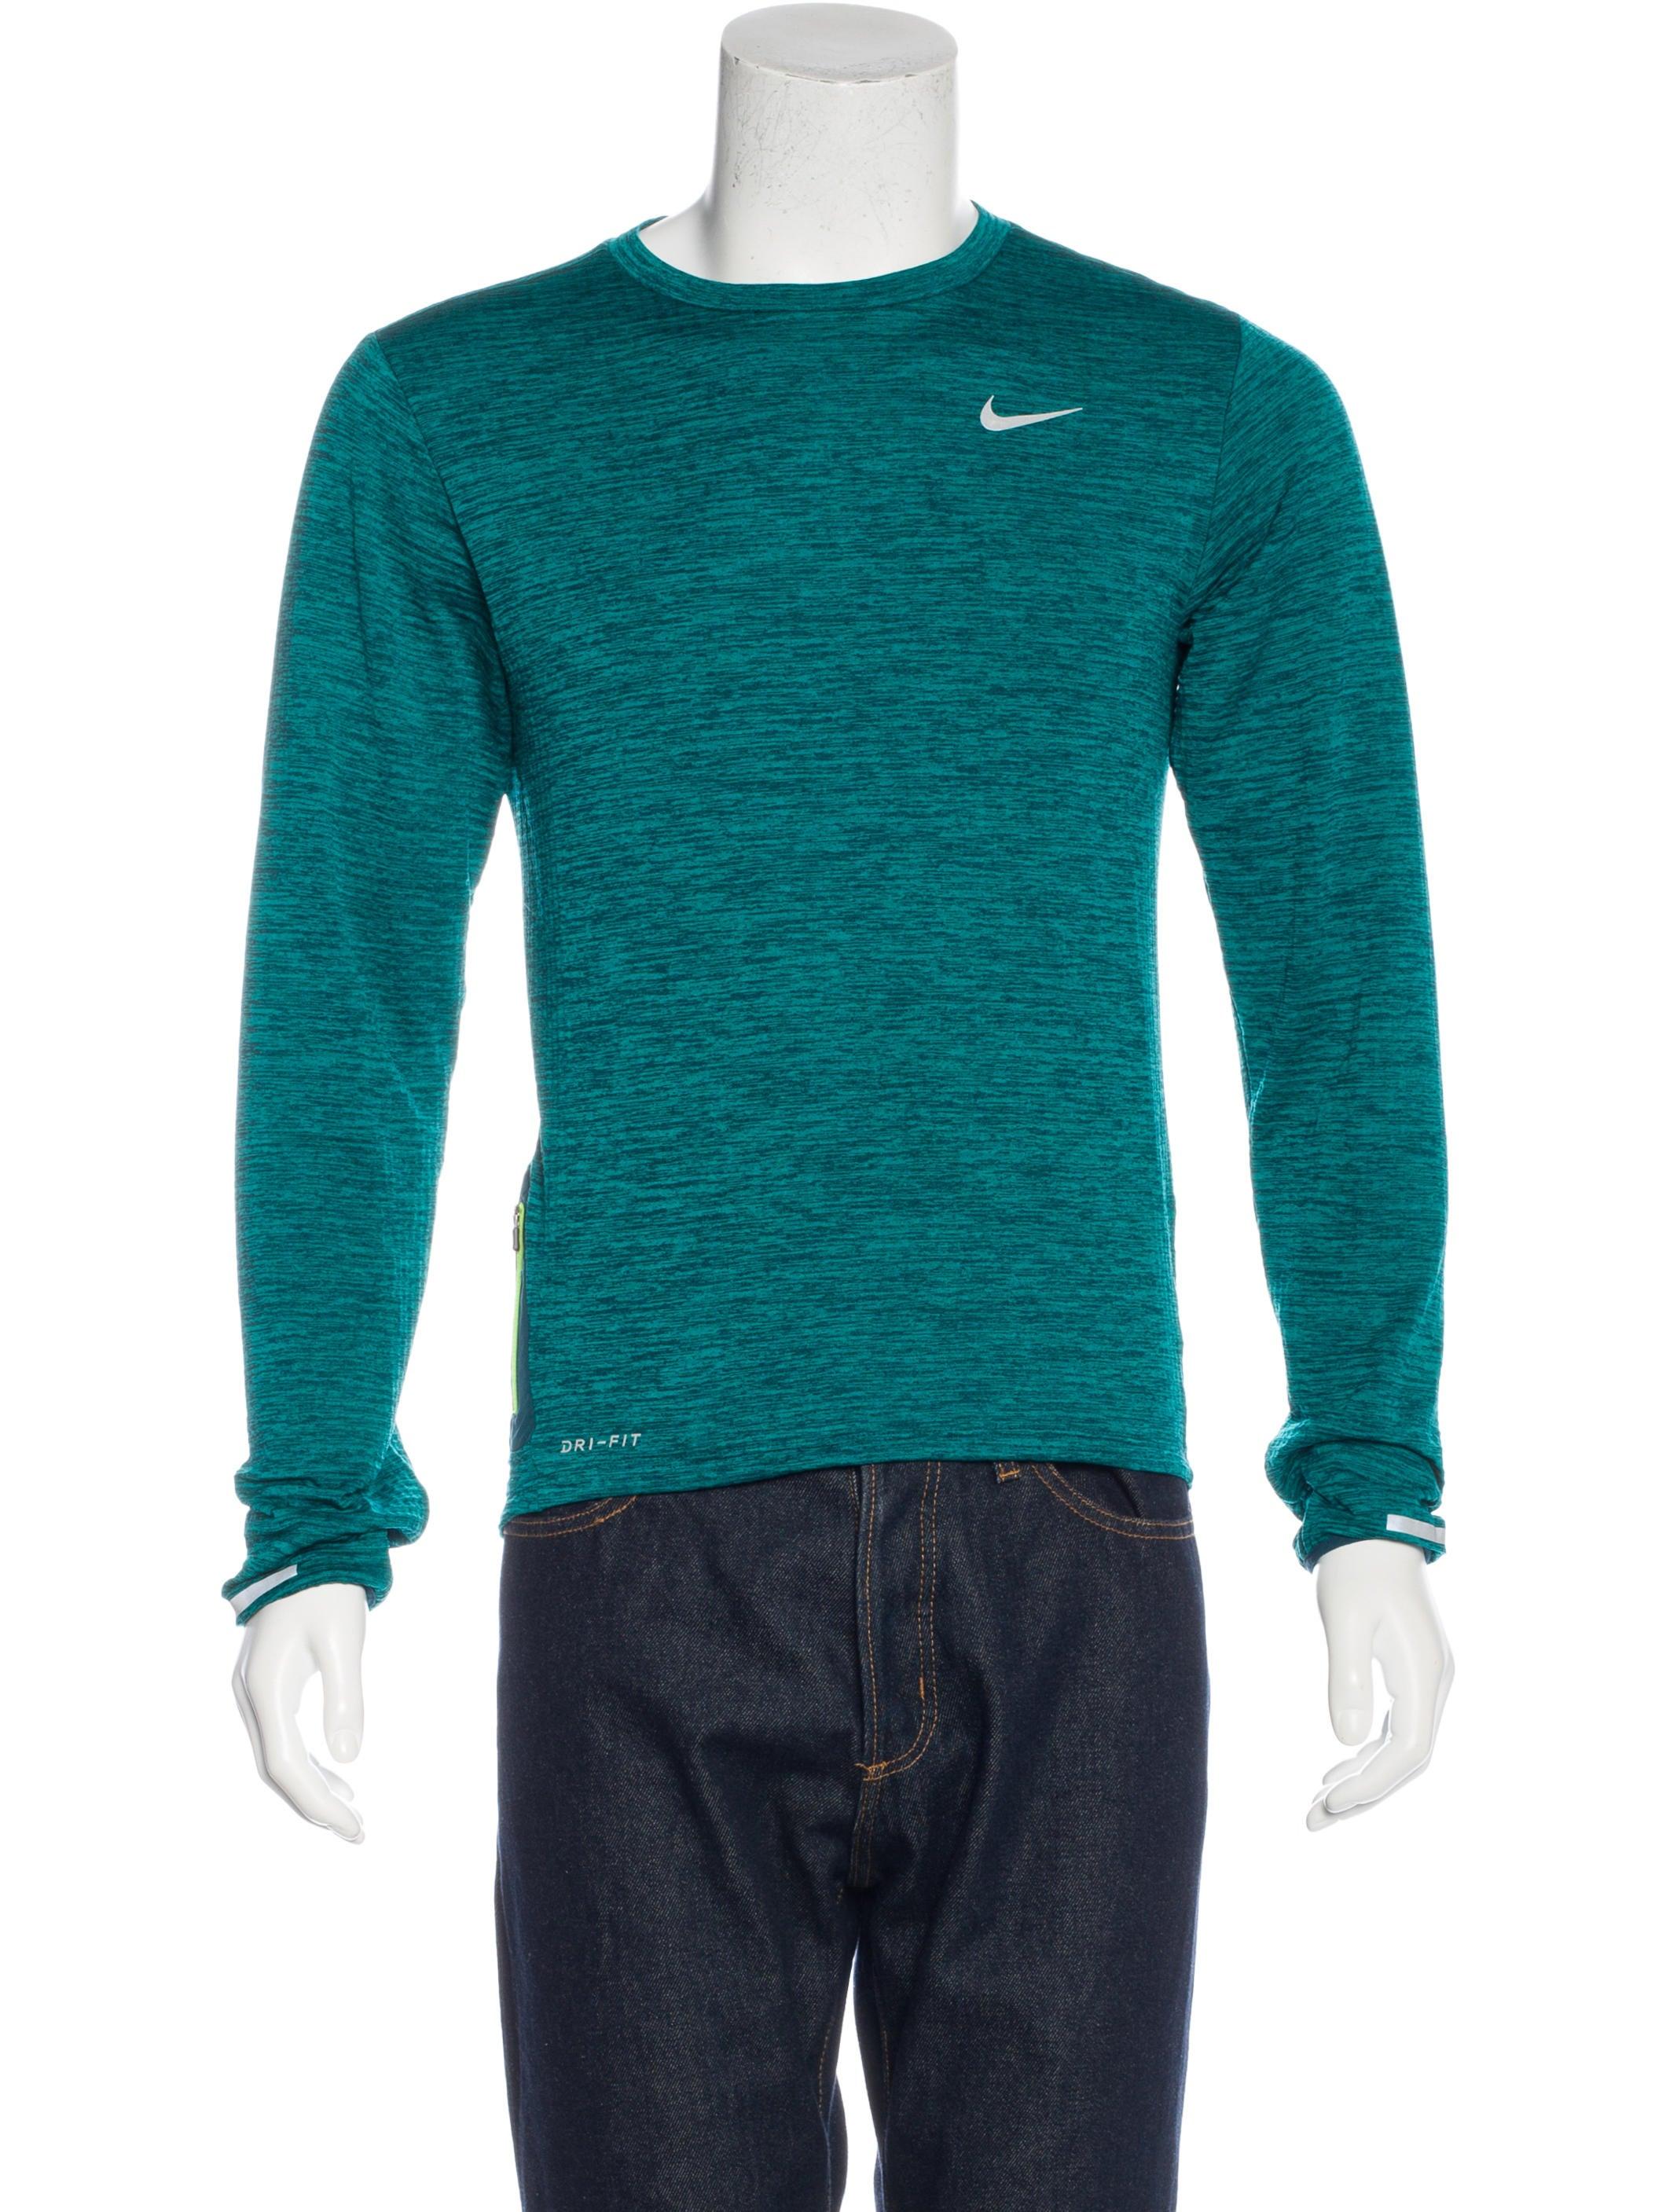 Nike dri fit running t shirt clothing wu221116 the for Dri fit material shirts